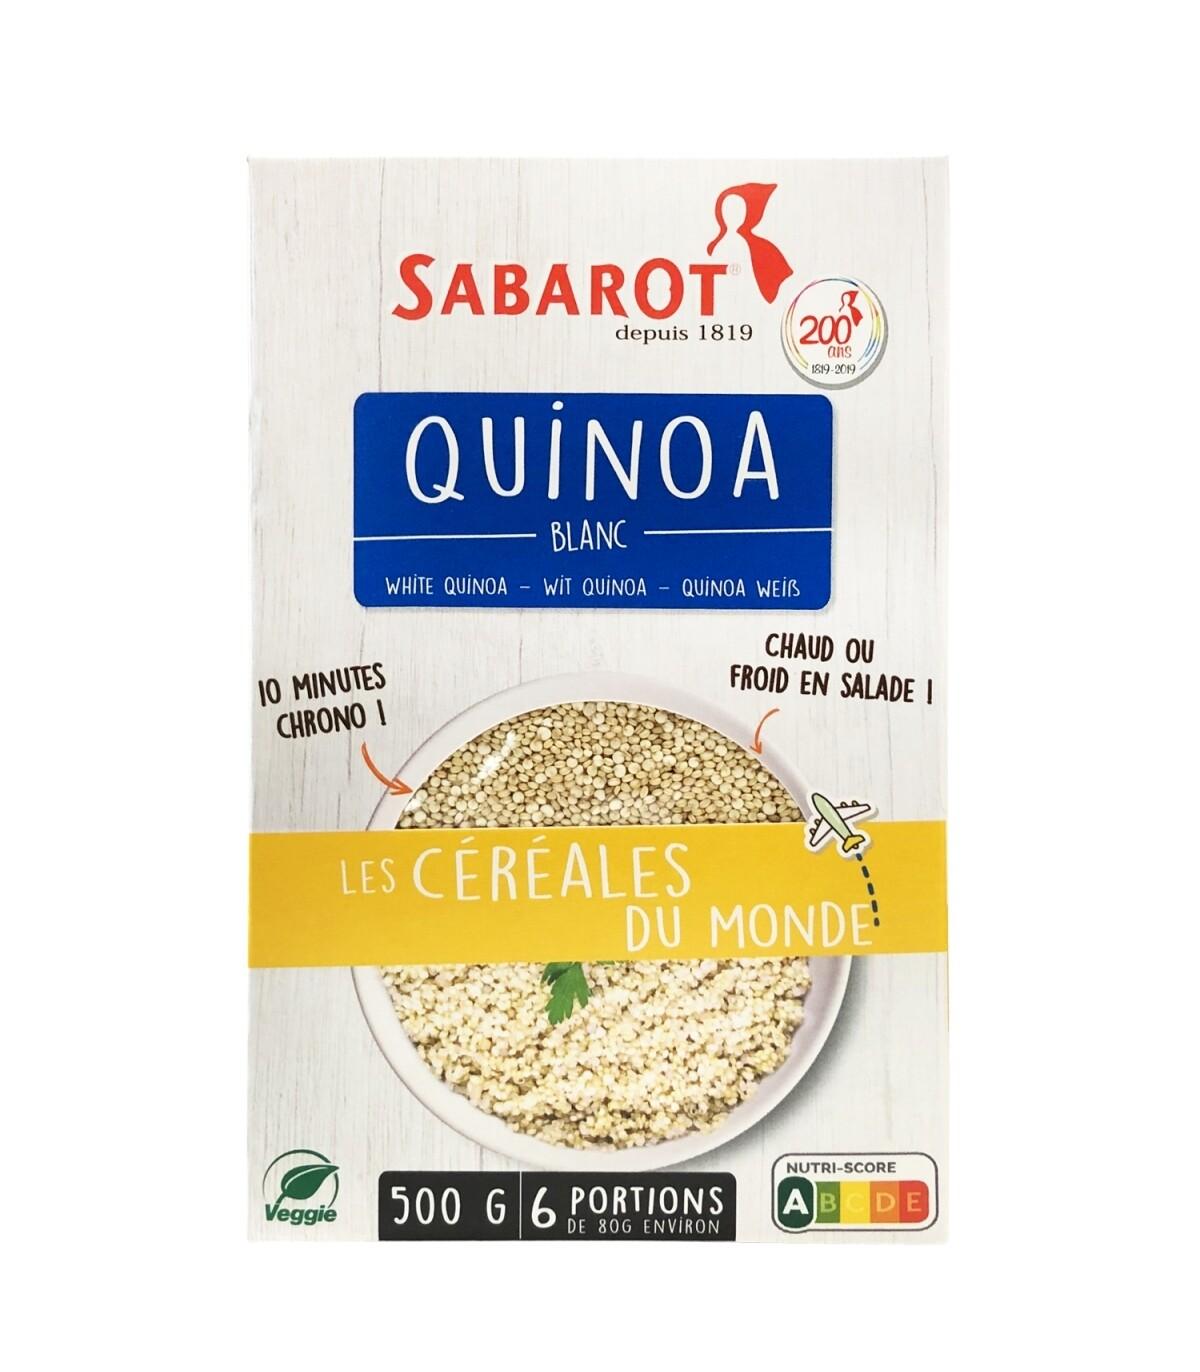 Sabarot - White Quinoa